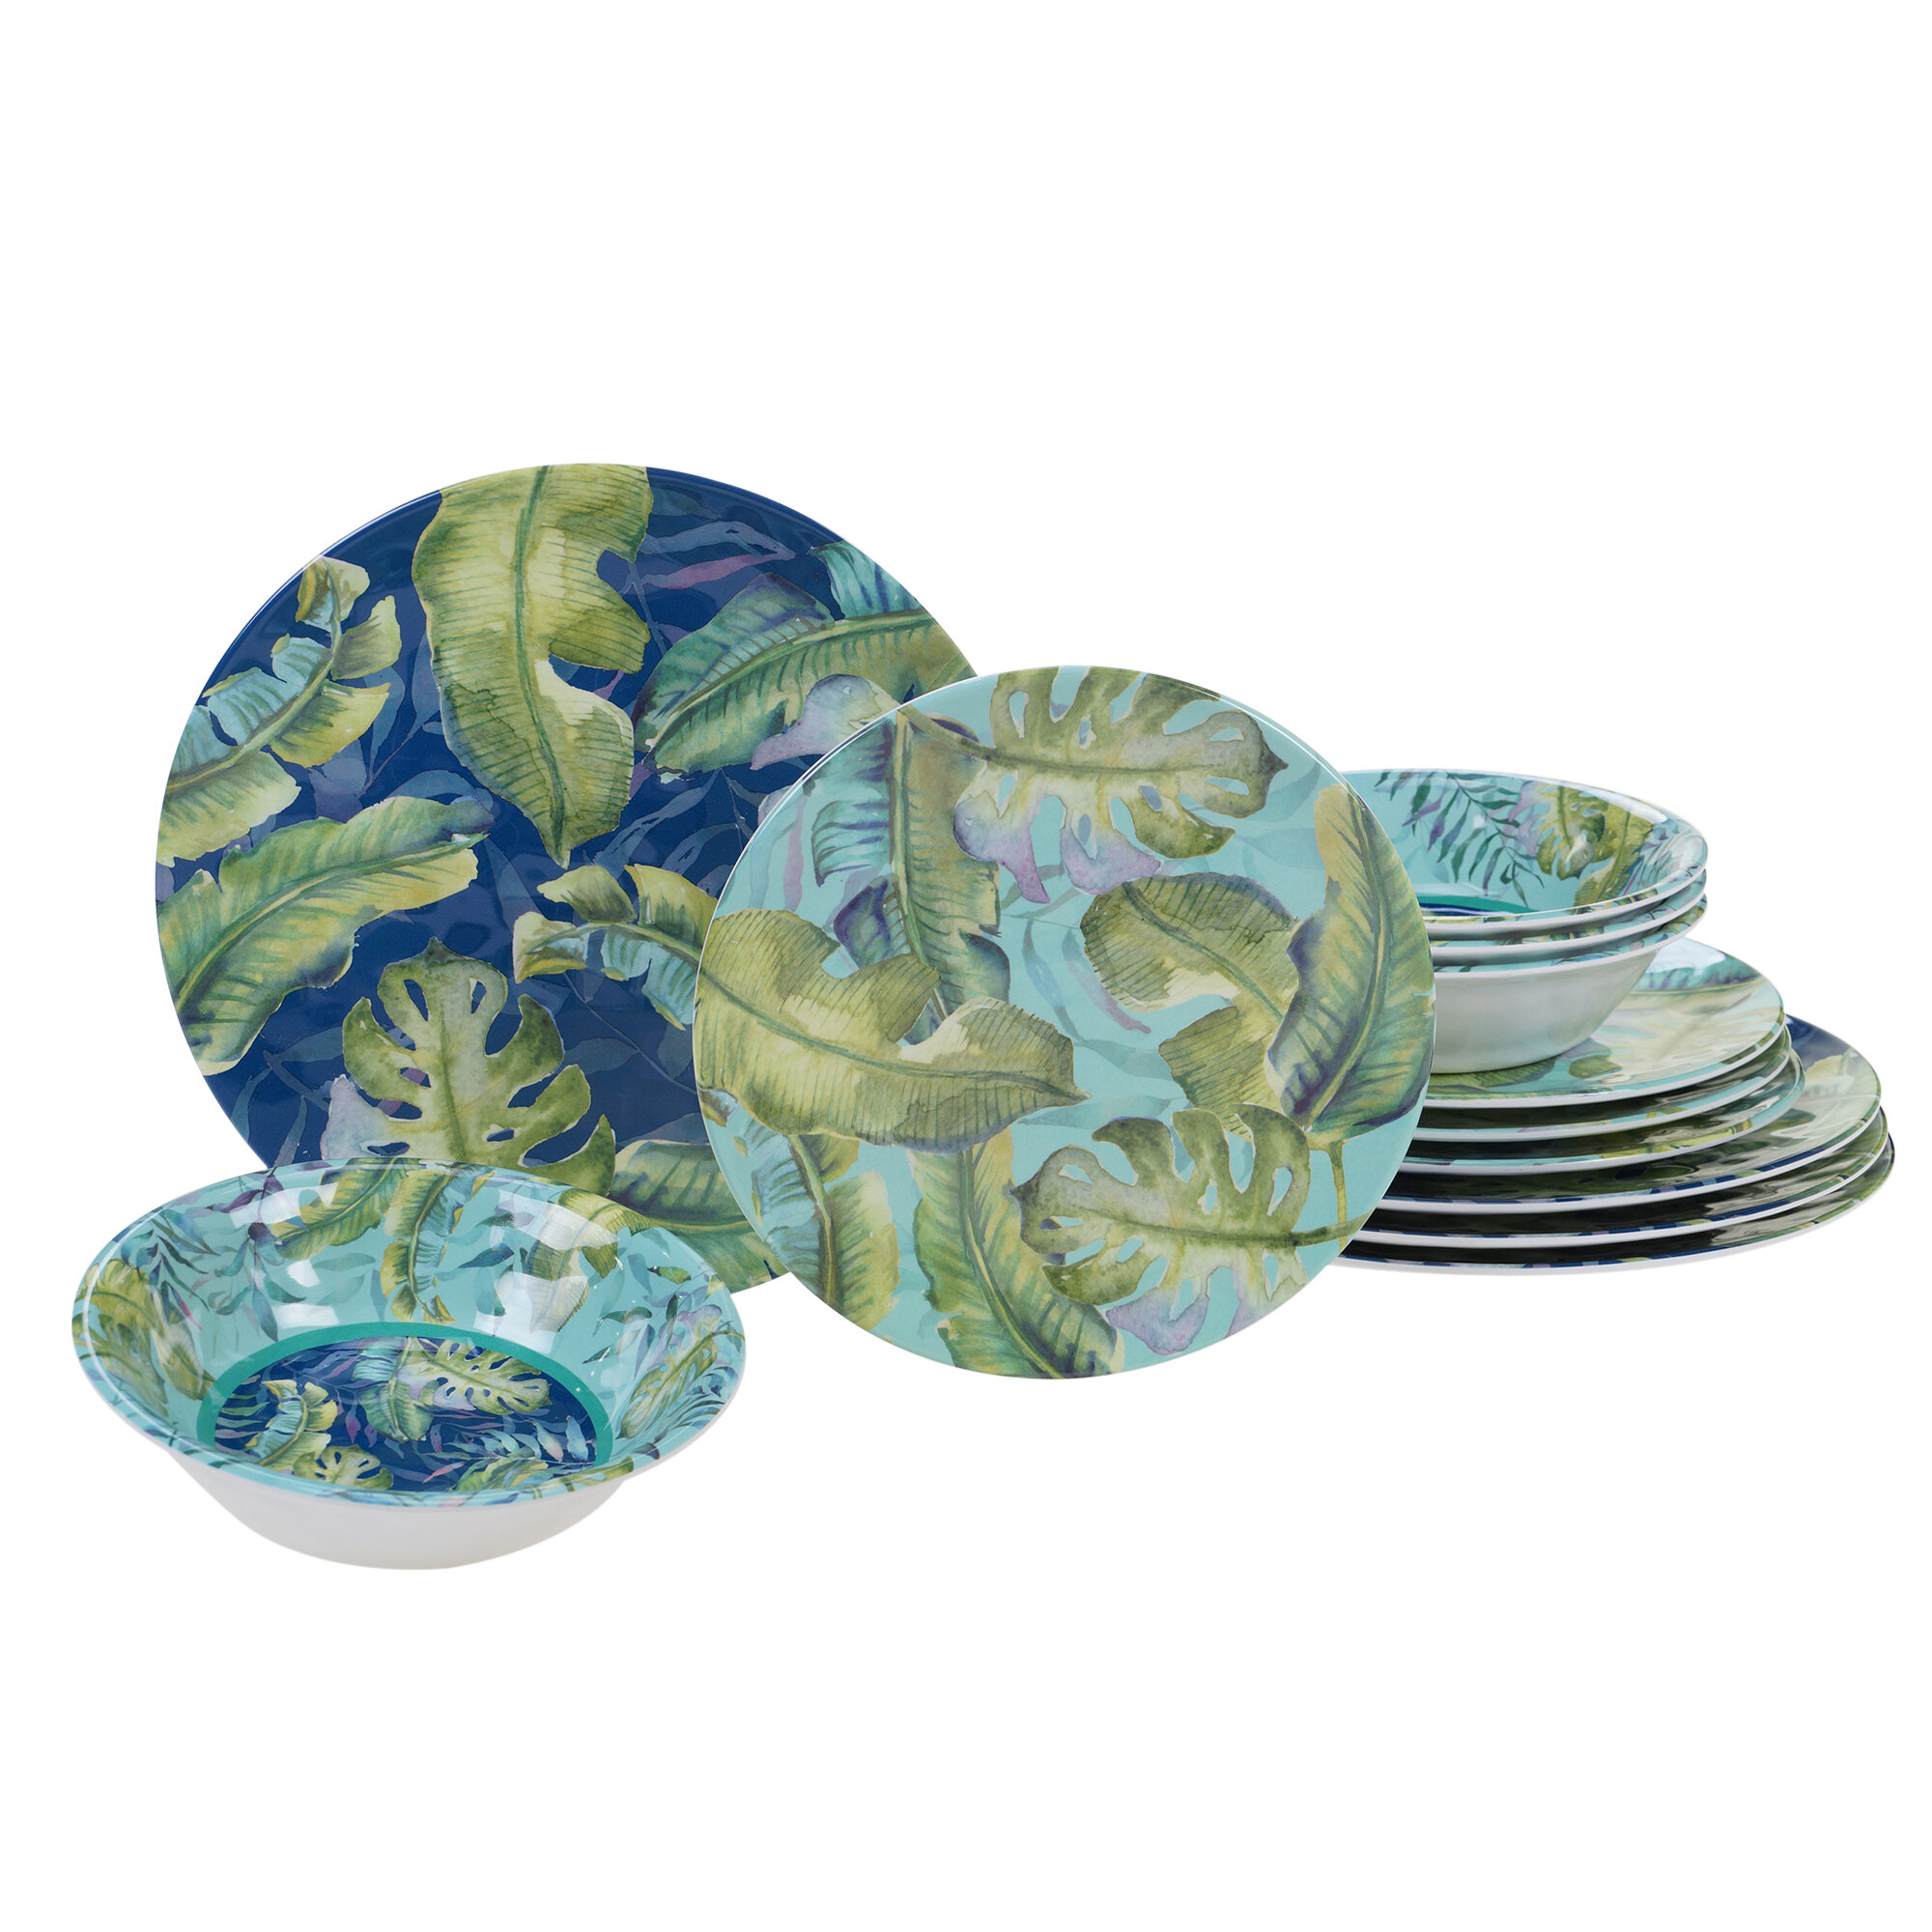 6 Nautica Pineapple Melamine Dinner Plate Set Teal Palm Leaves Bamboo Tropical